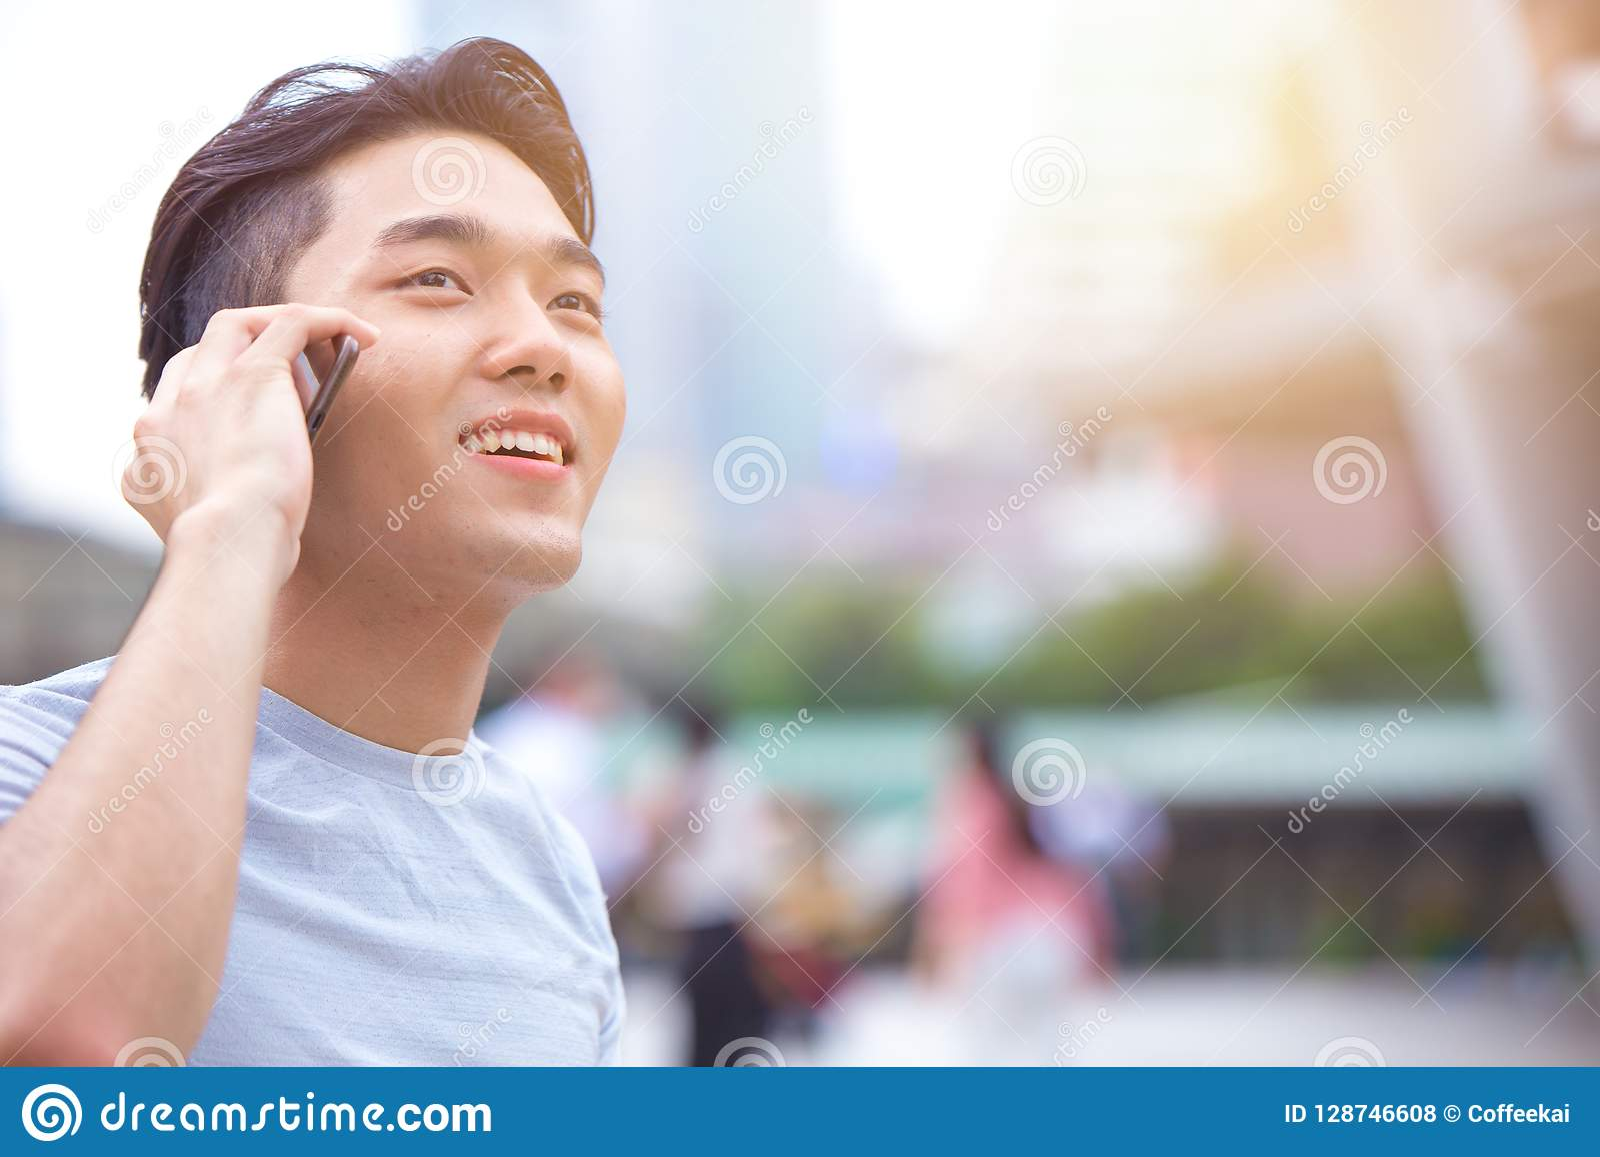 Giovane telefonata di chiamata teenager maschio asiatica astuta